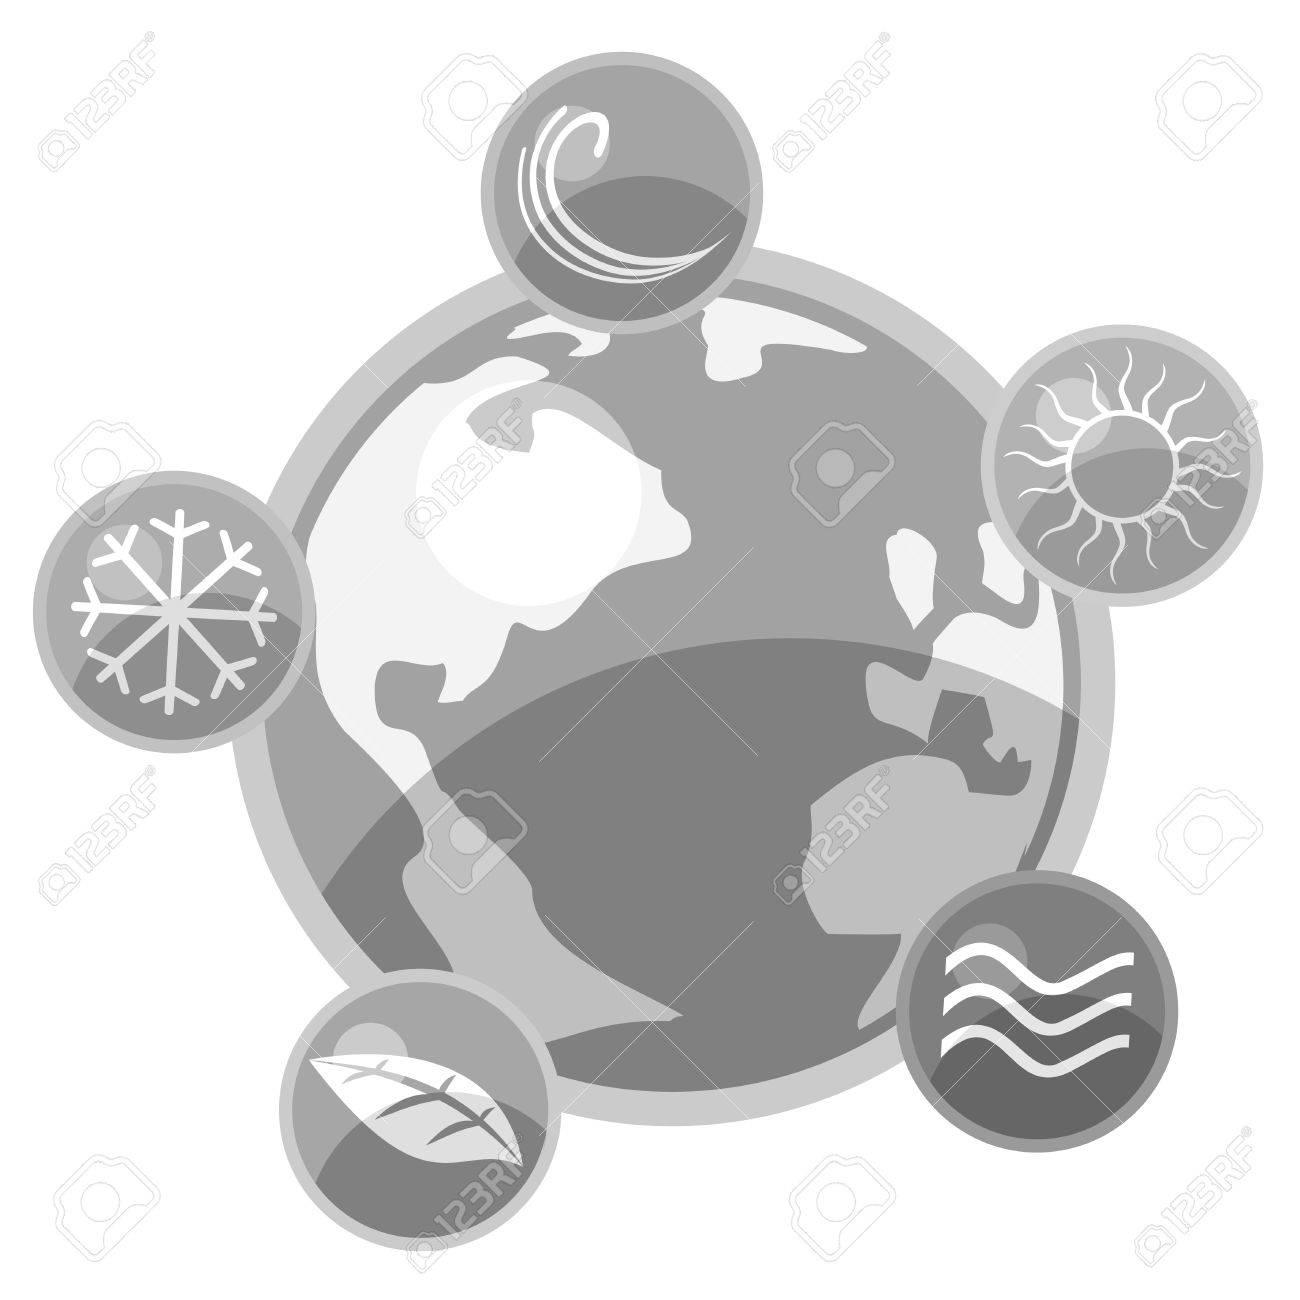 Art world nature icons Stock Vector - 13778278